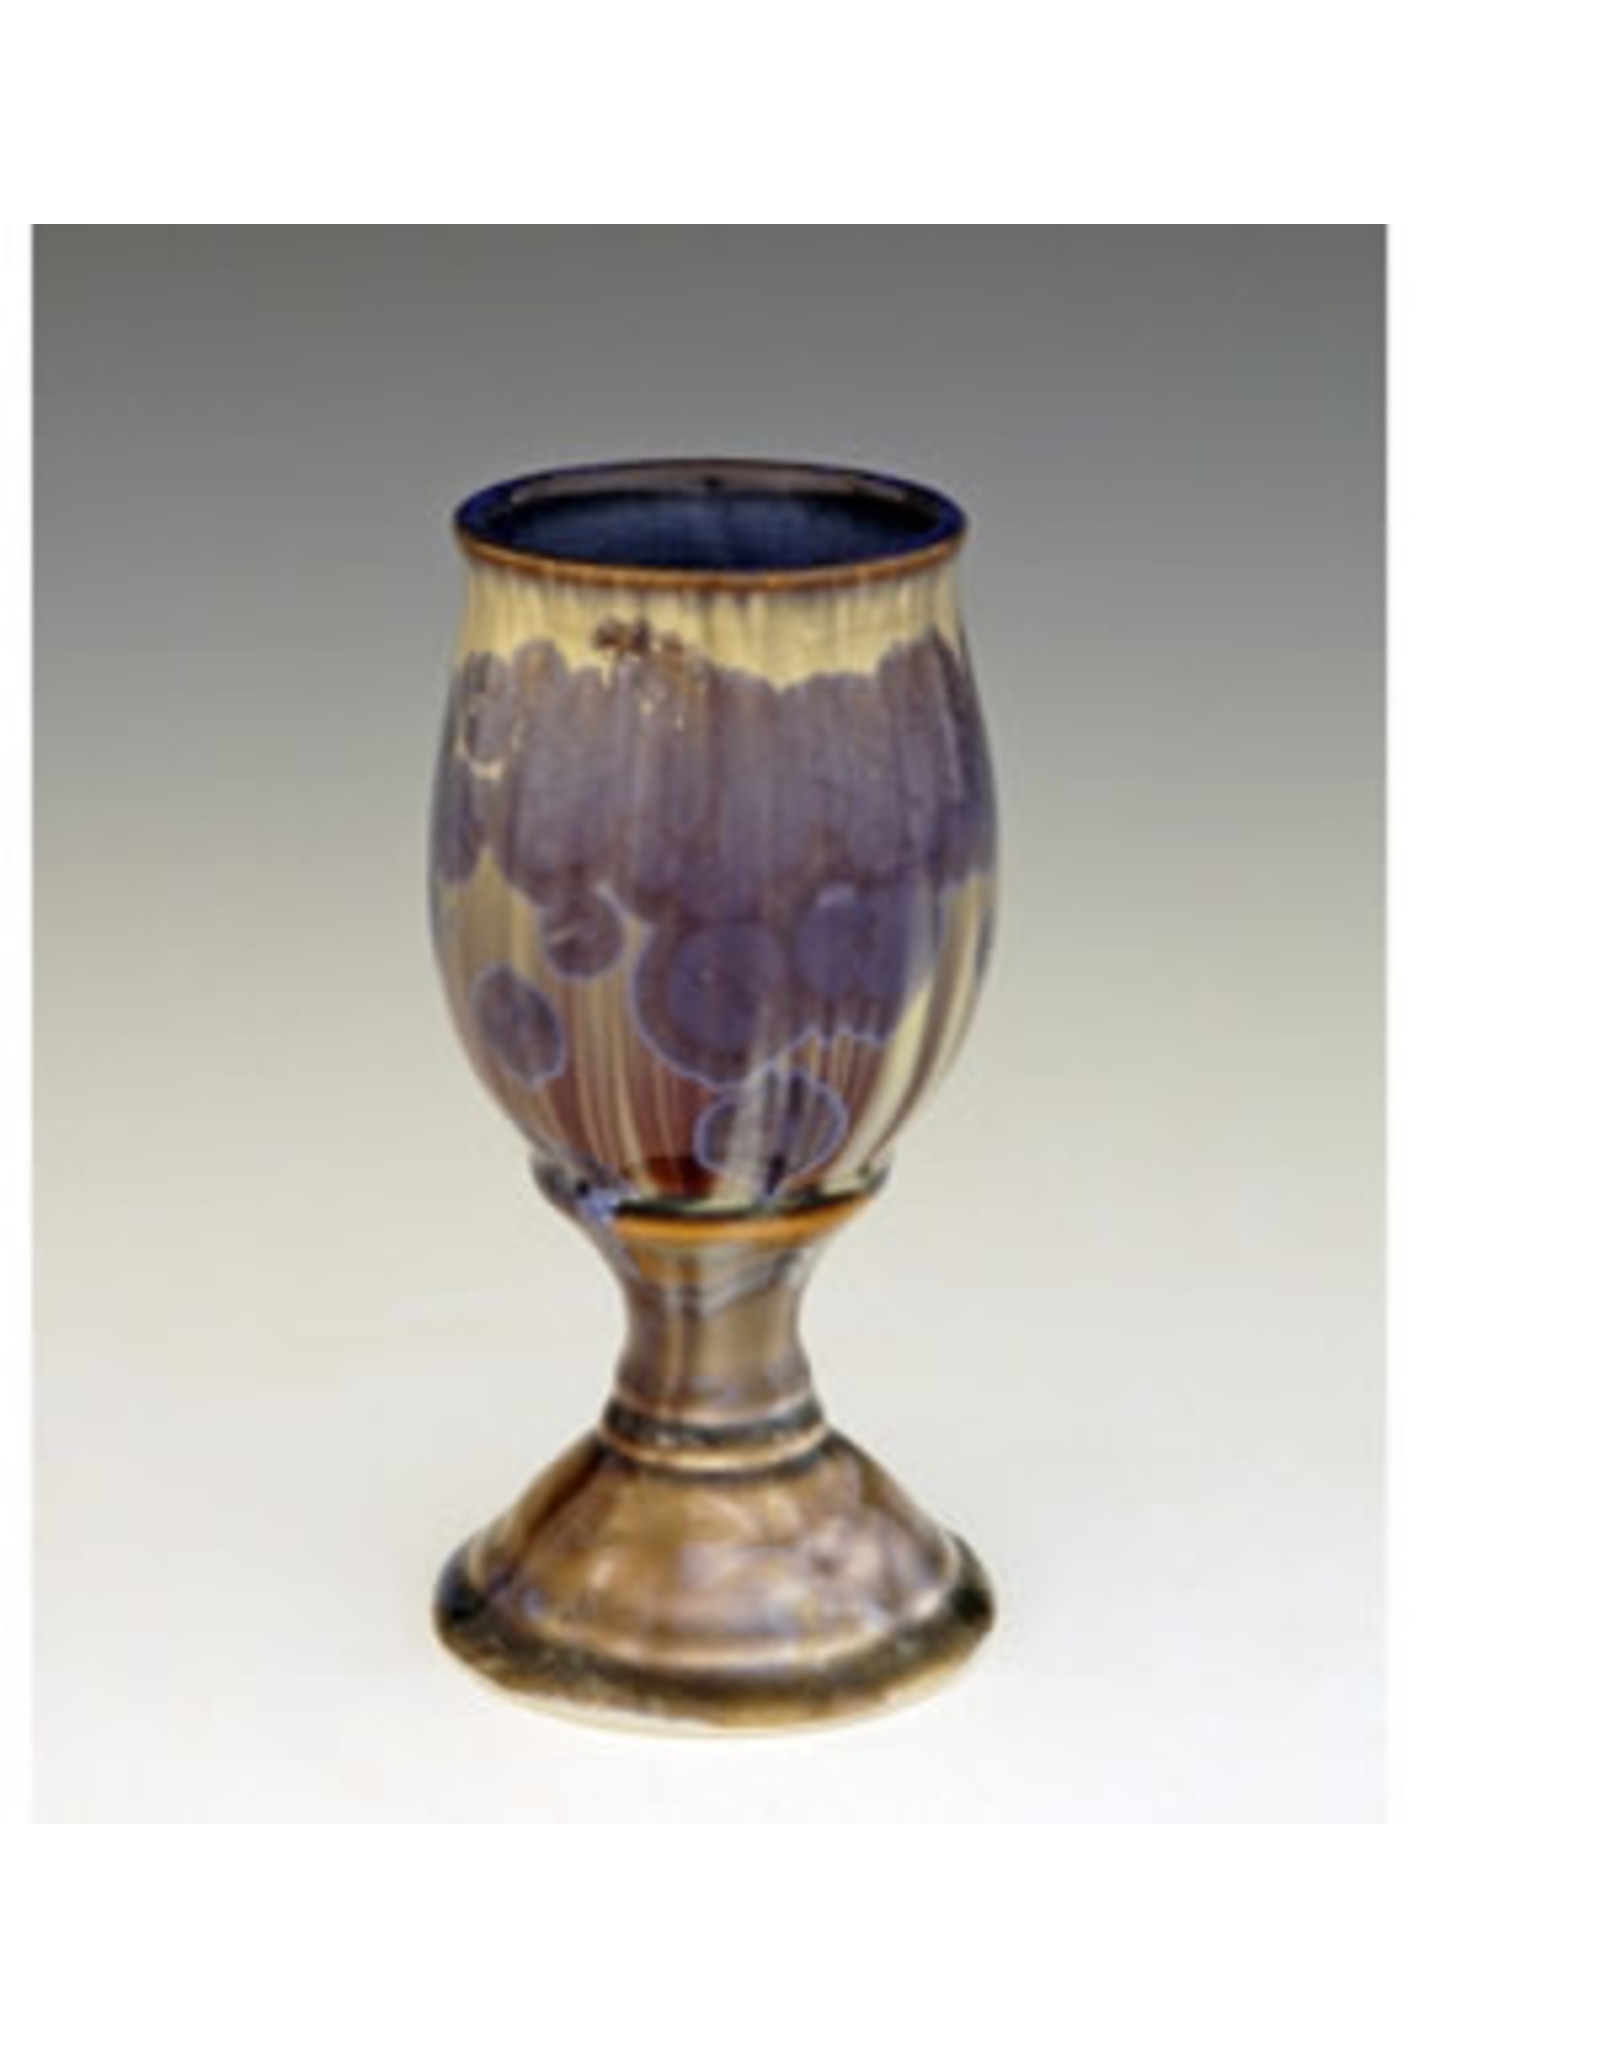 Stellar Art Pottery Stellar Art Pottery Goblet